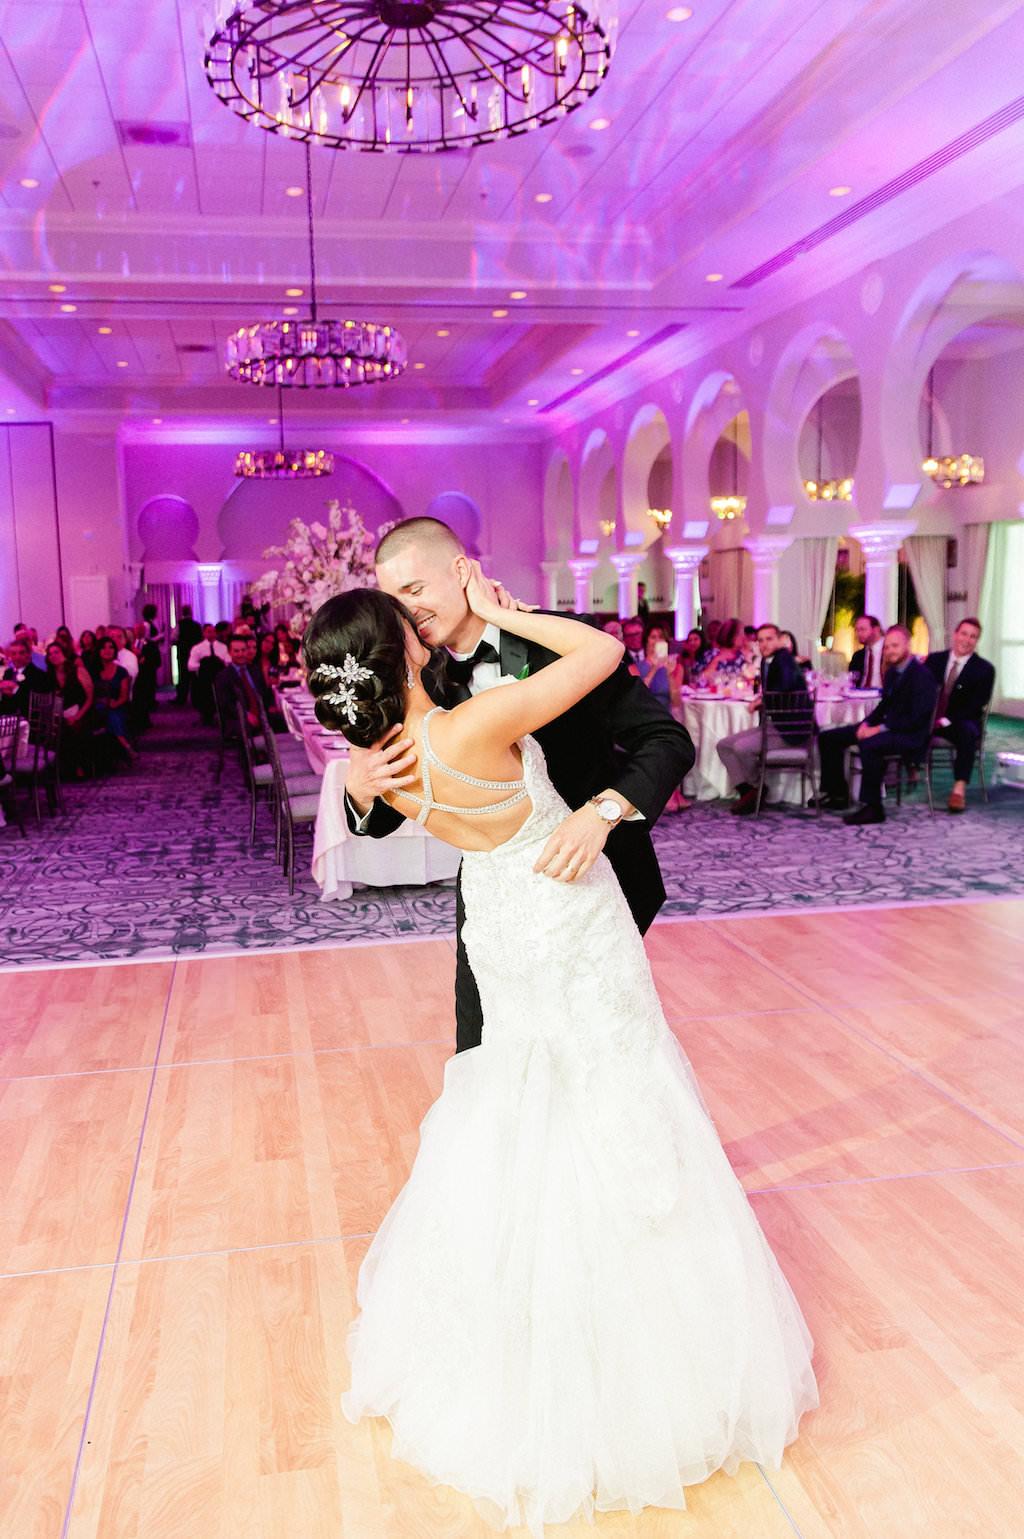 Bride and Groom First Dance Ballroom Wedding Portrait   St. Petersburg Wedding Photographer Ailyn La Torre   Tampa Hair Artist Femme Akoi